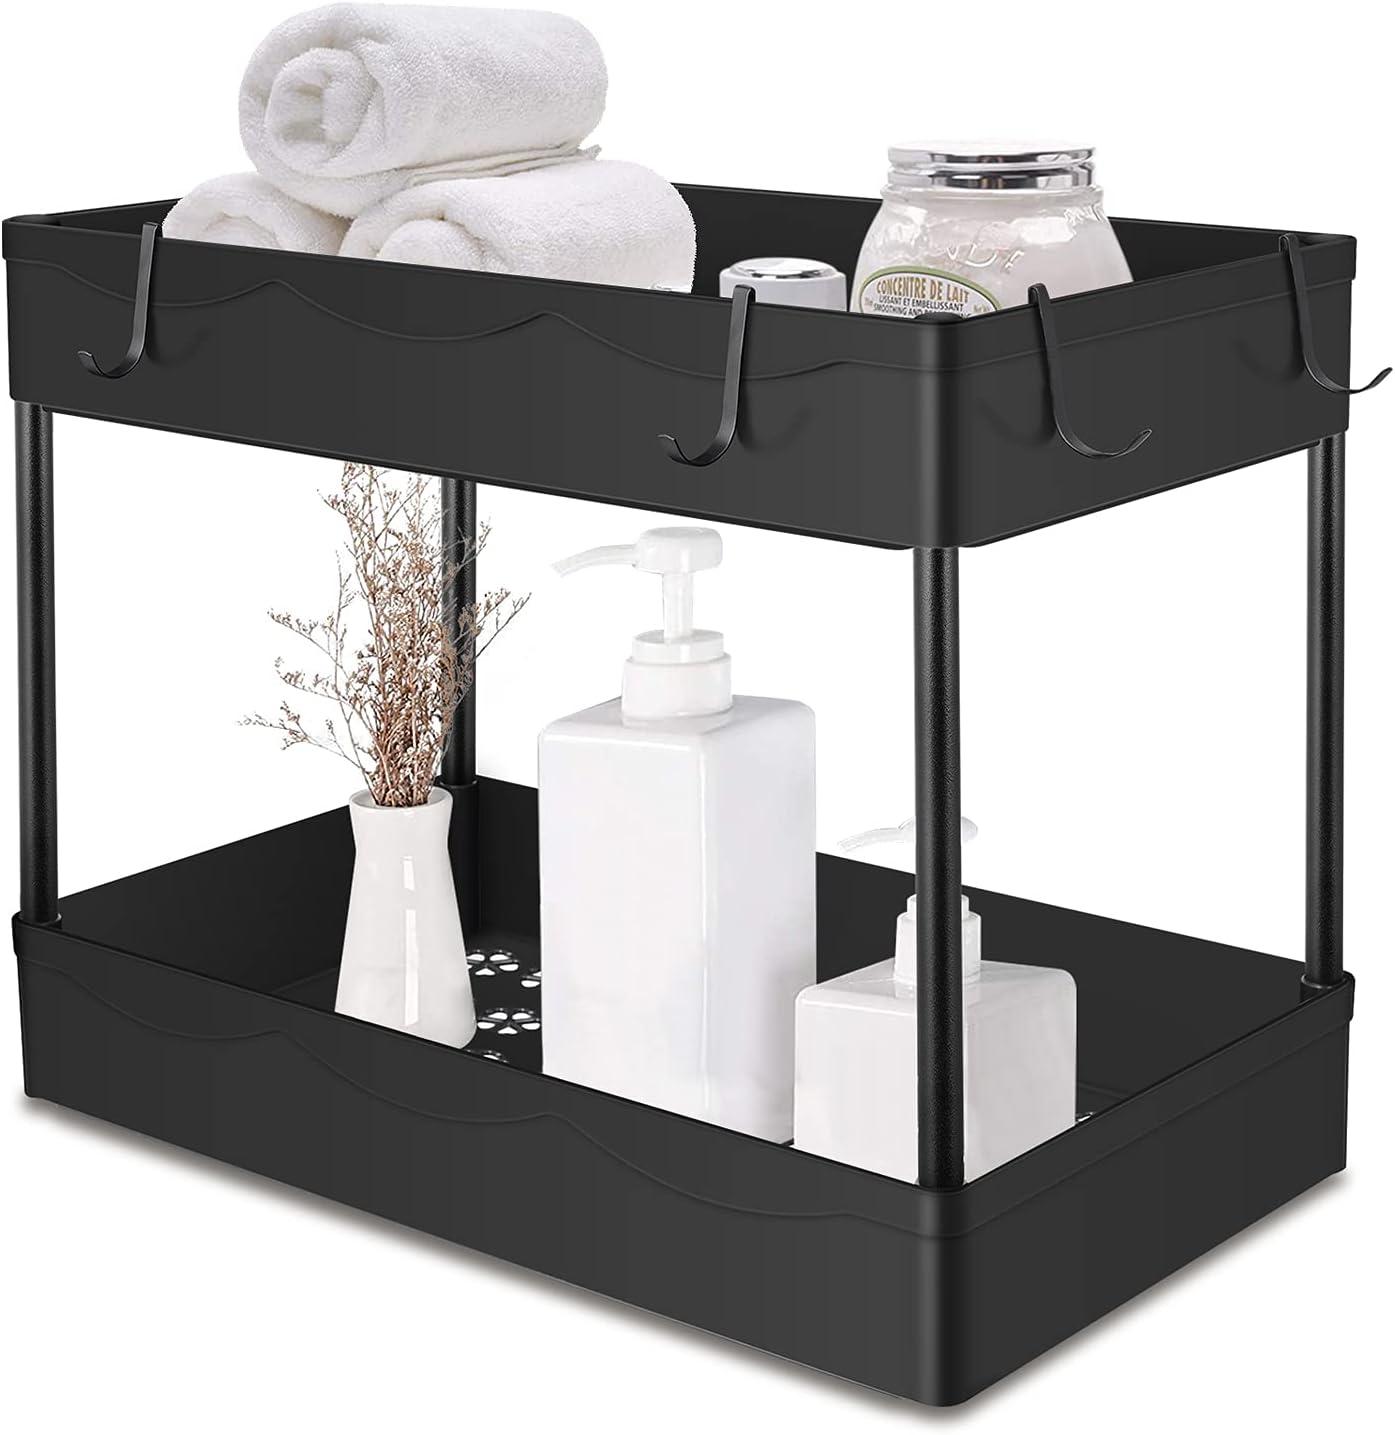 Under Sink Organizer 2 Regular store Max 86% OFF Tier Standing wit Bathroom Rack